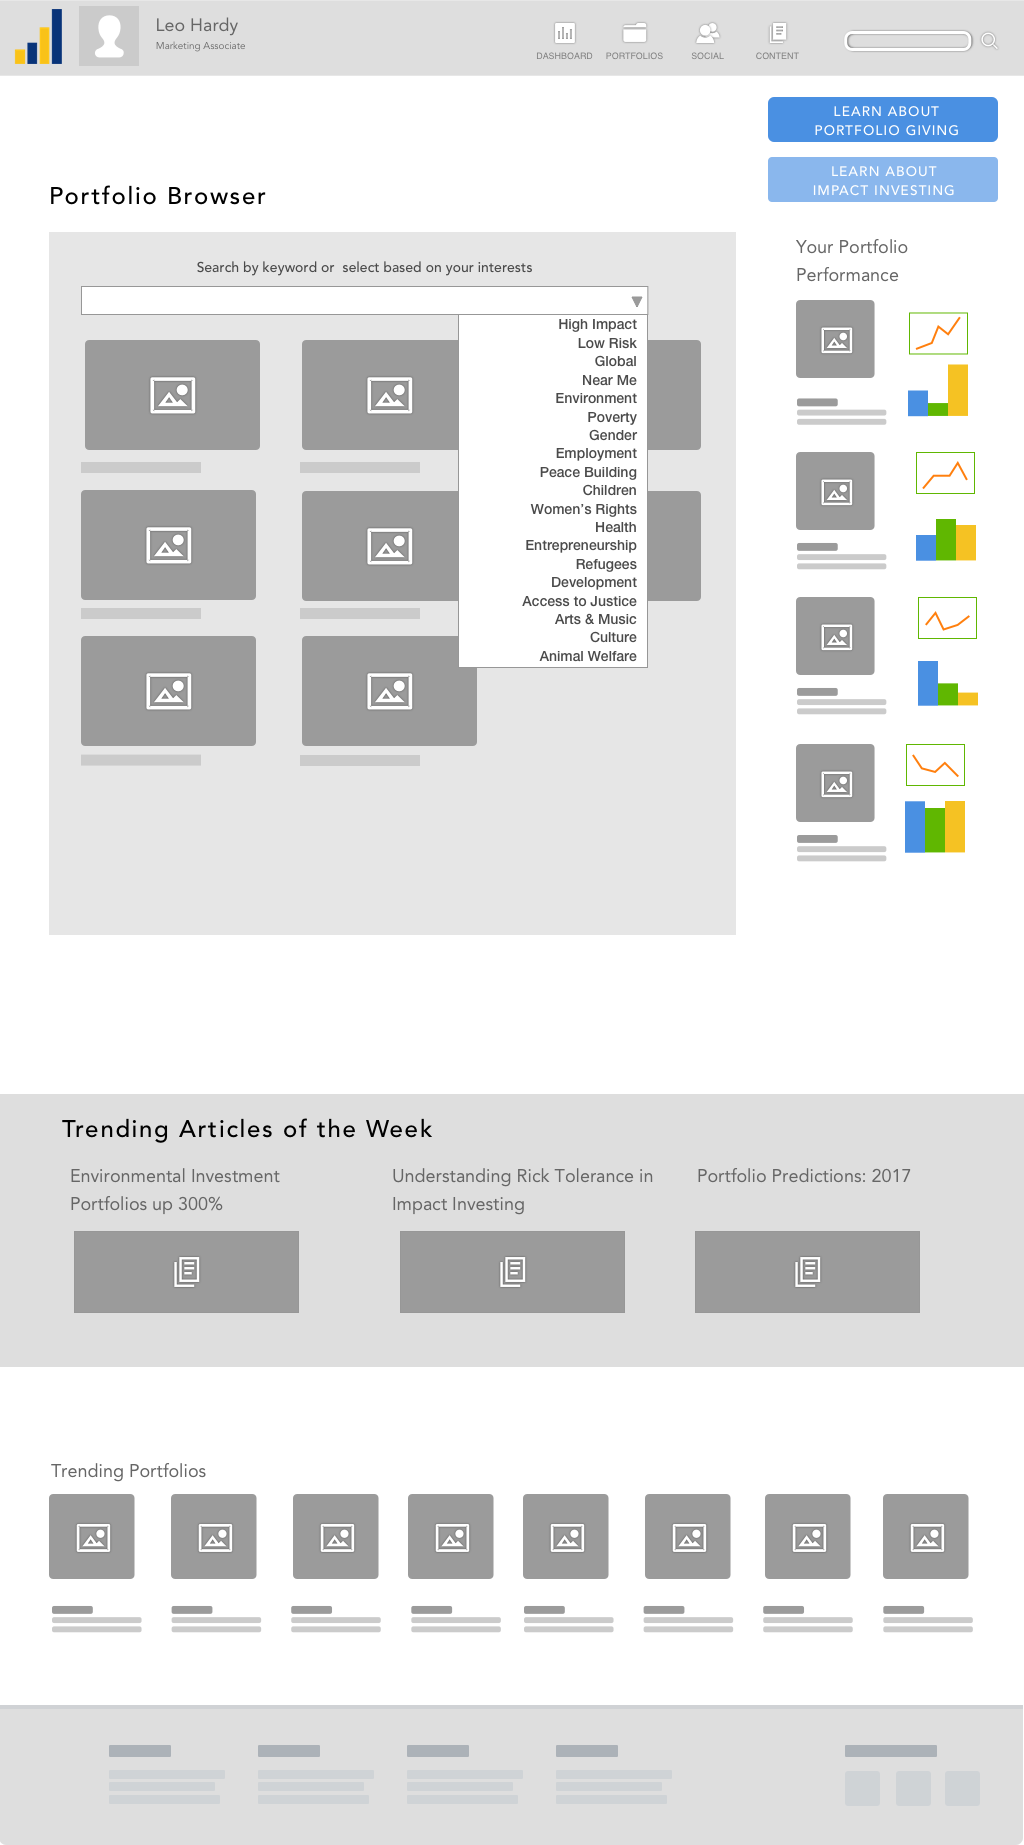 3 Portfolio Browser.png